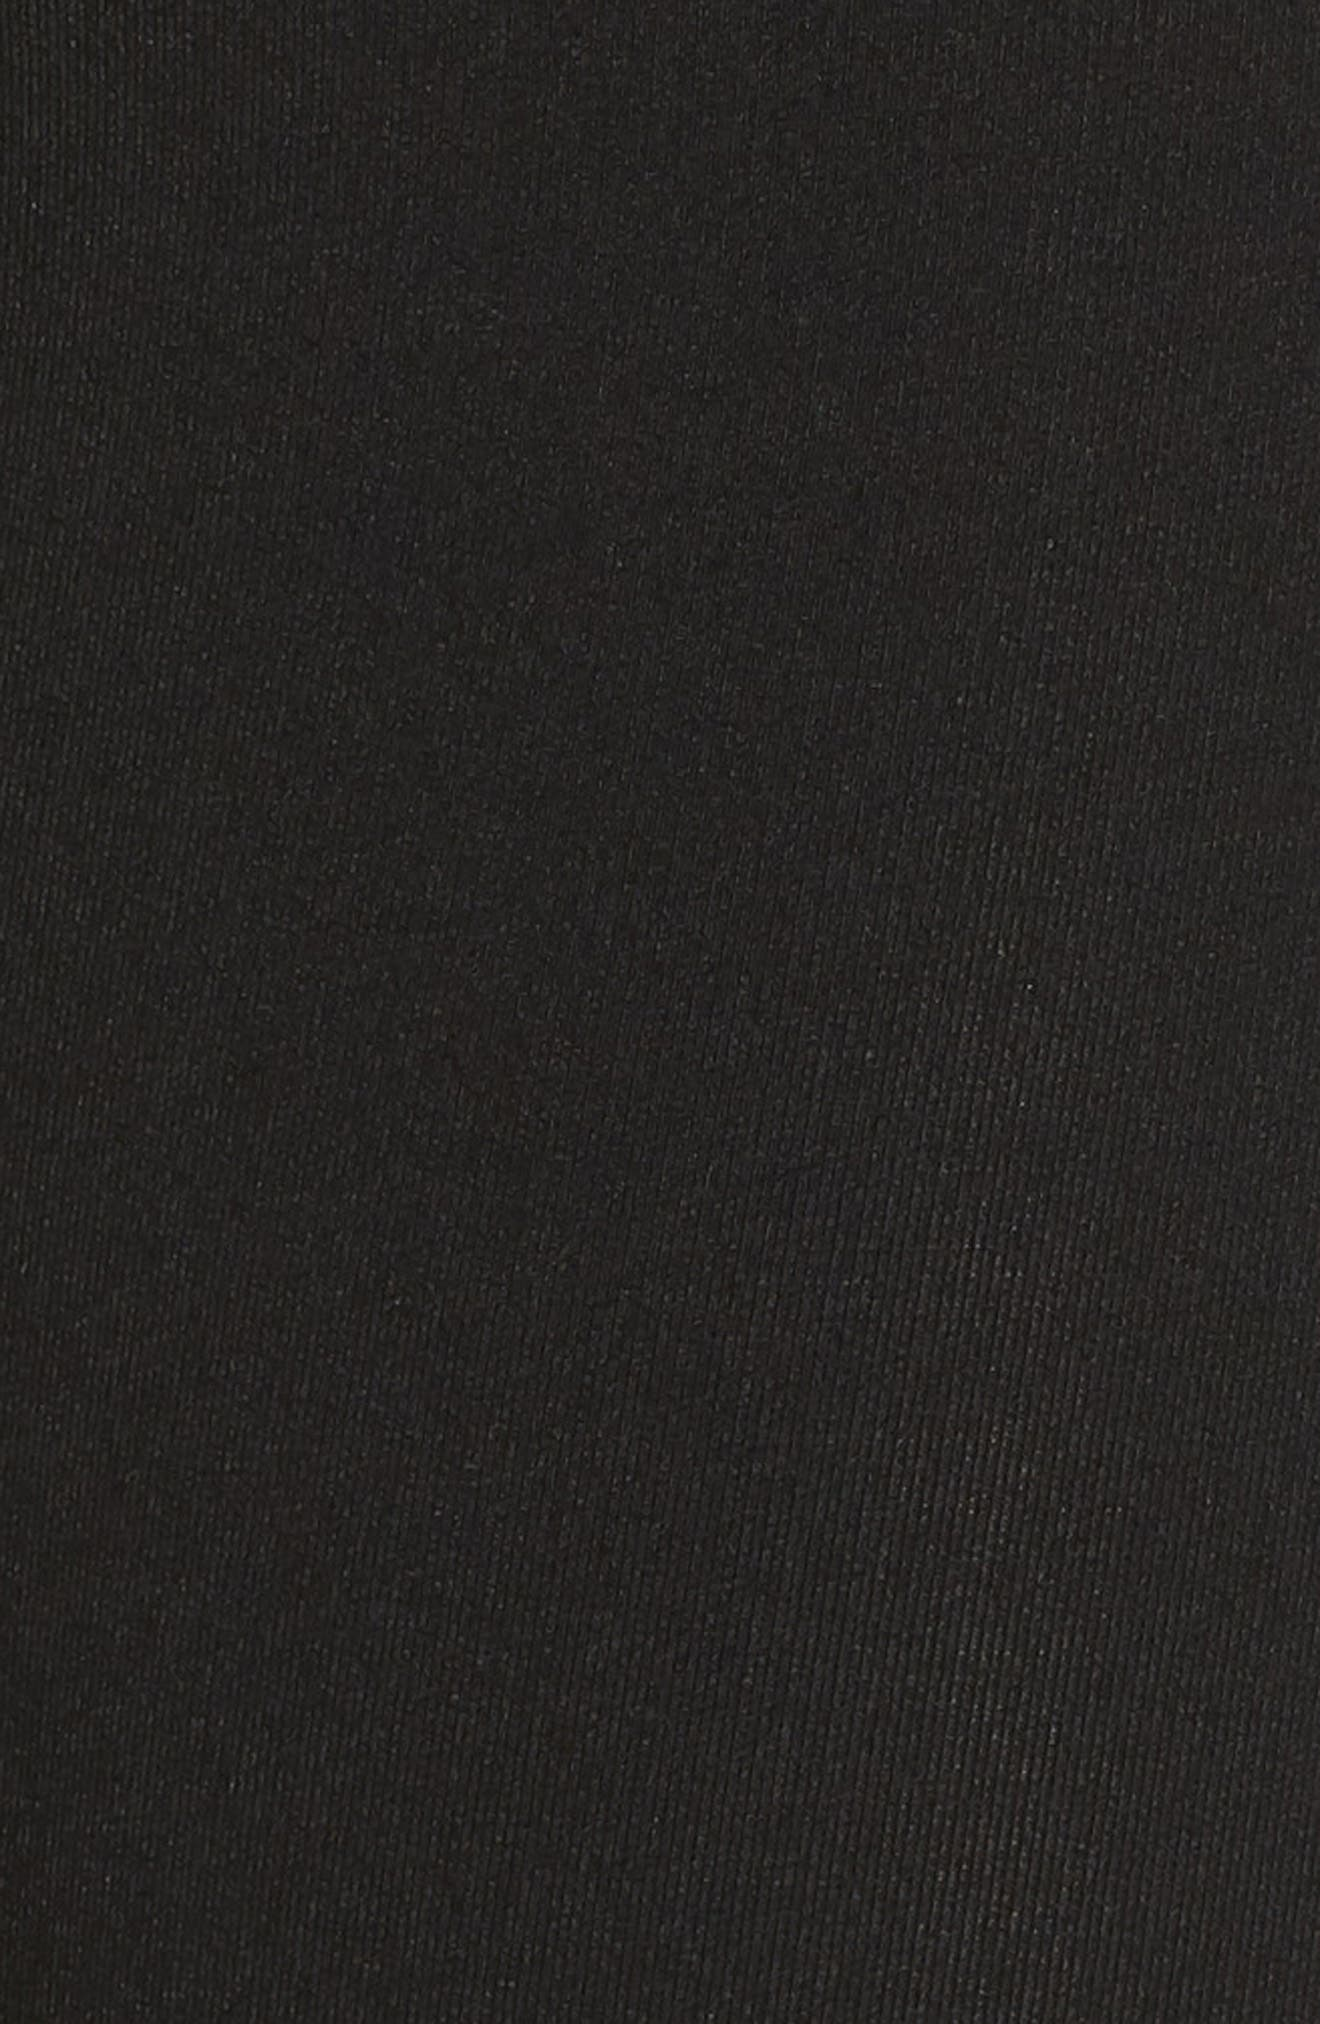 Comet Winter Sports Tights,                             Alternate thumbnail 6, color,                             BLACK